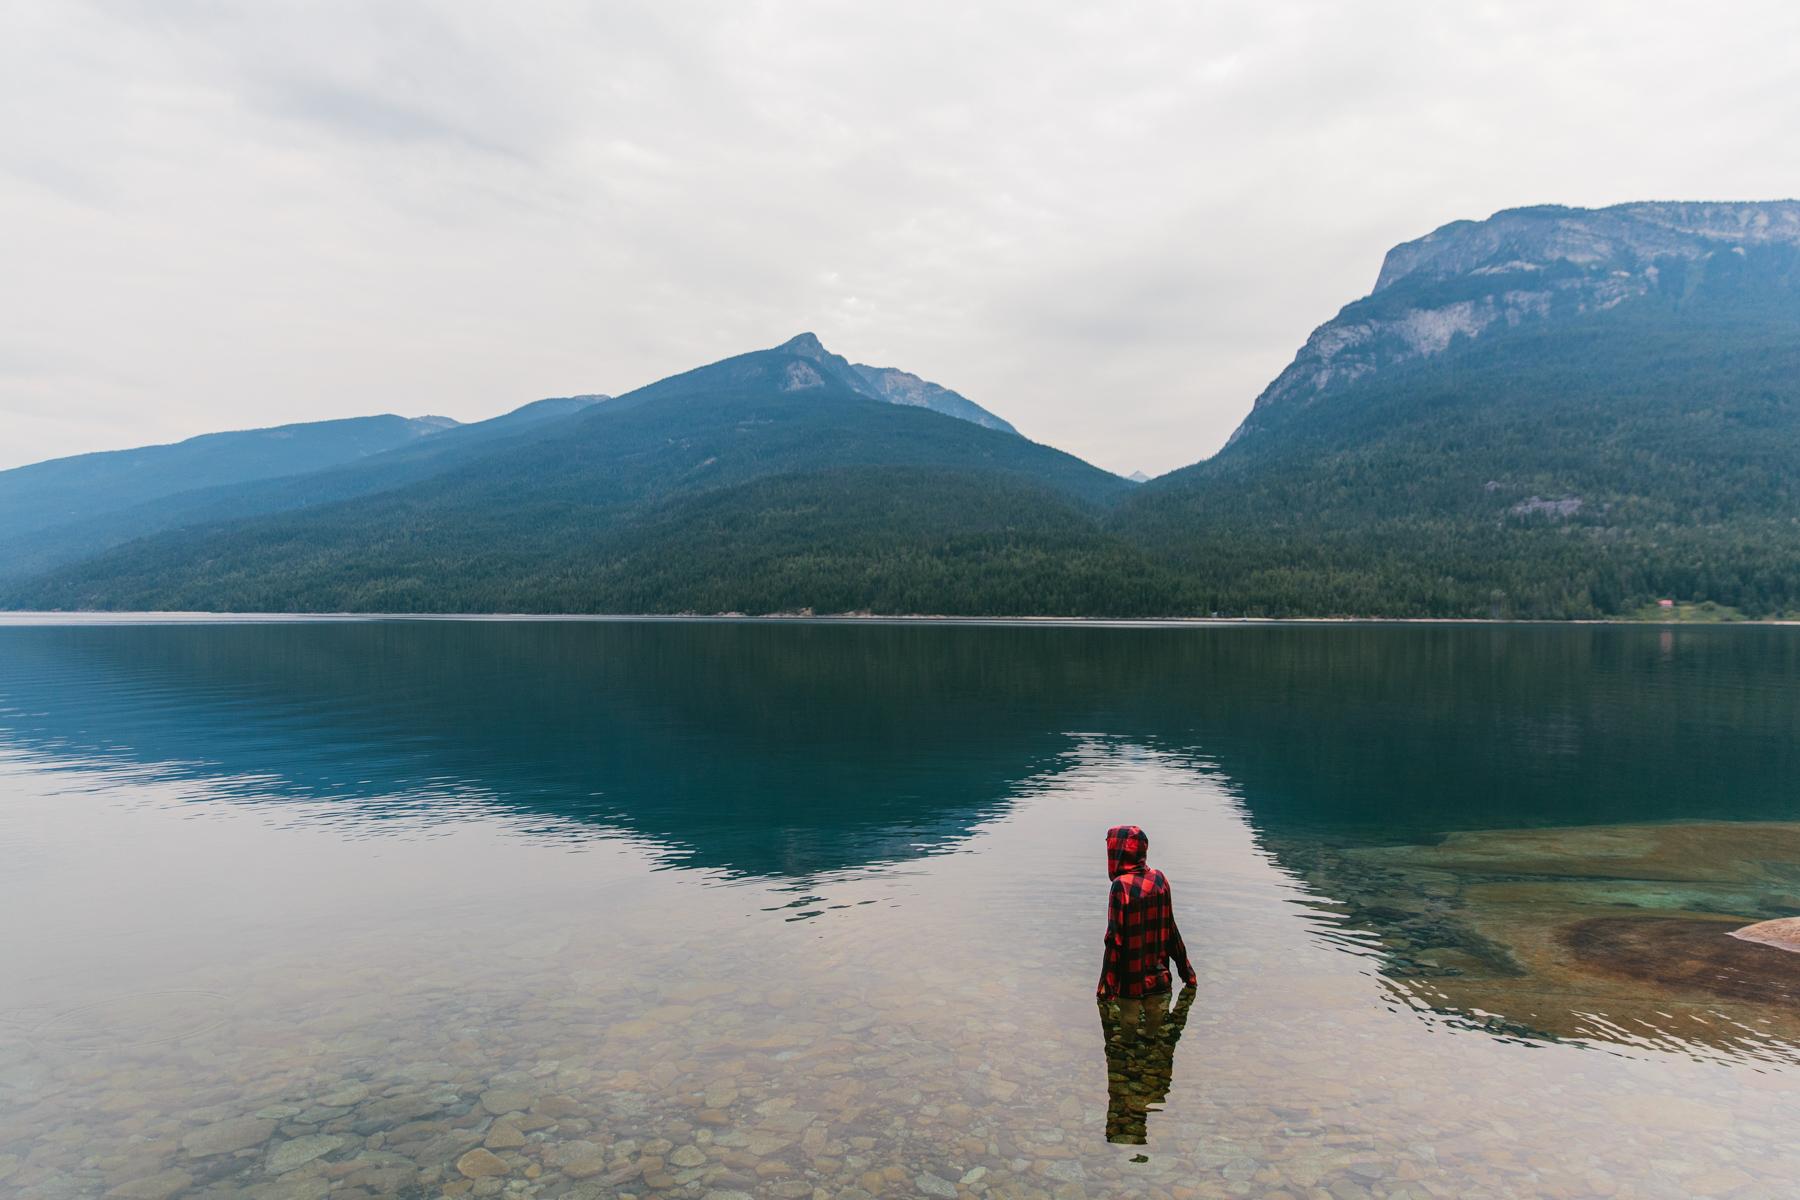 britishcolumbia-canada-lifestyle-photography-mikeseehagel-122